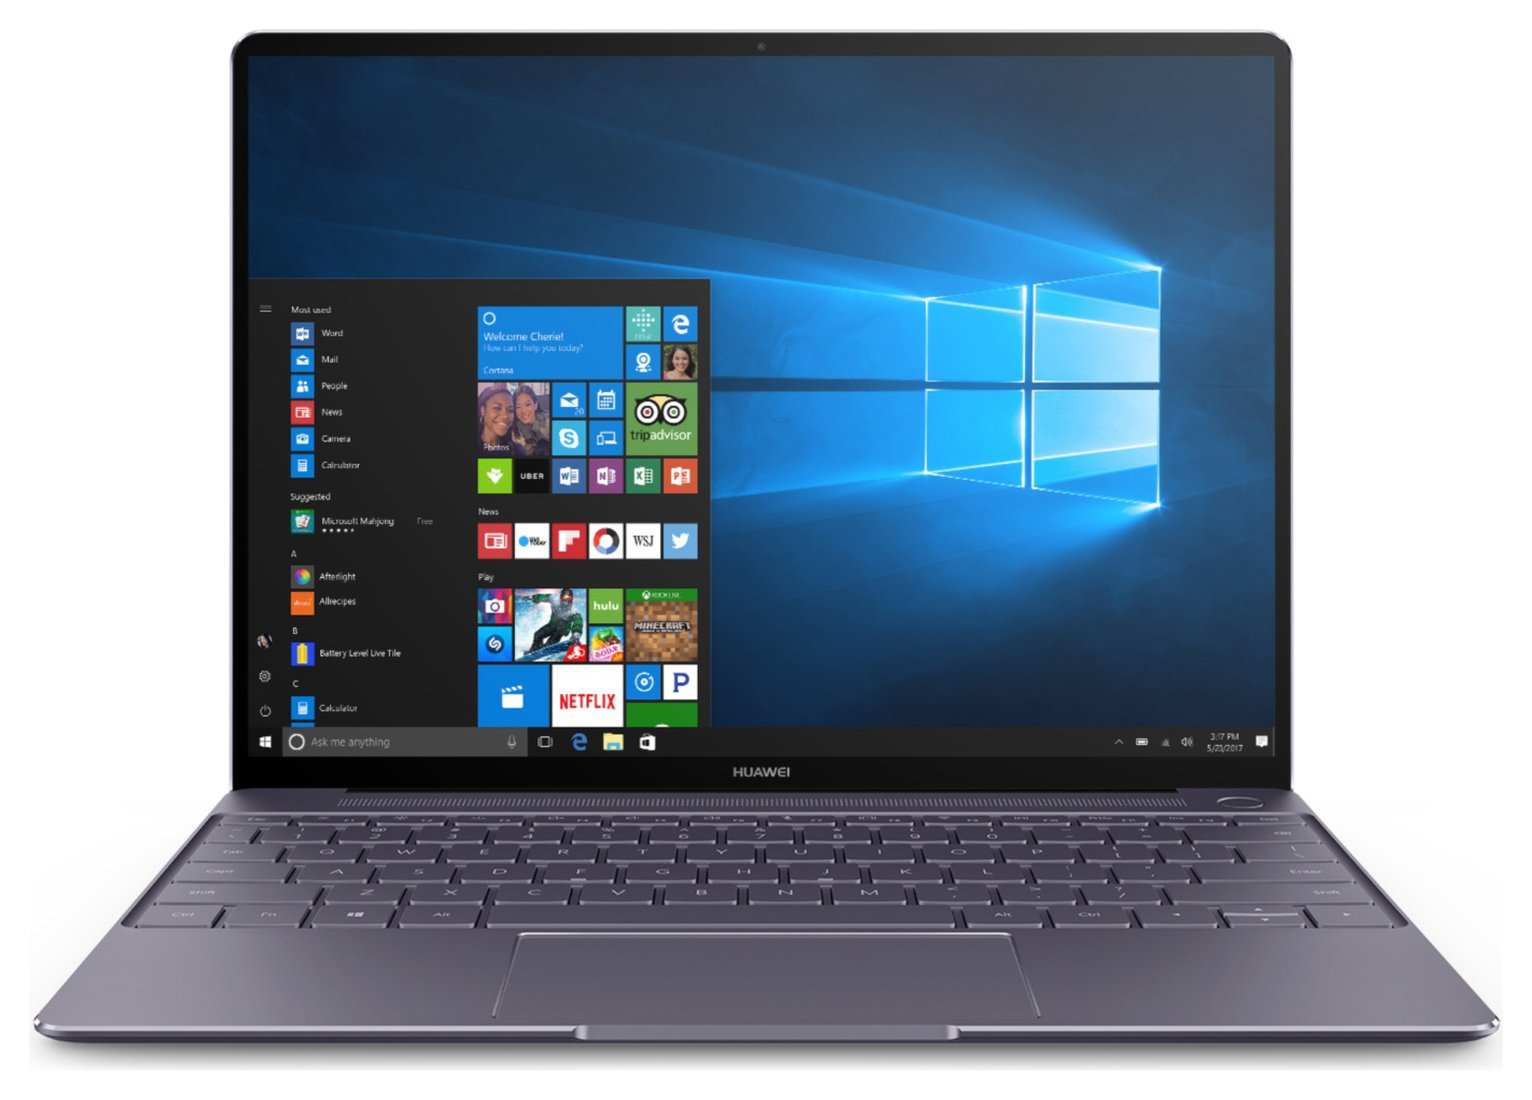 Huawei MateBook X 13 Inch i5 8GB 256GB Laptop - Space Grey